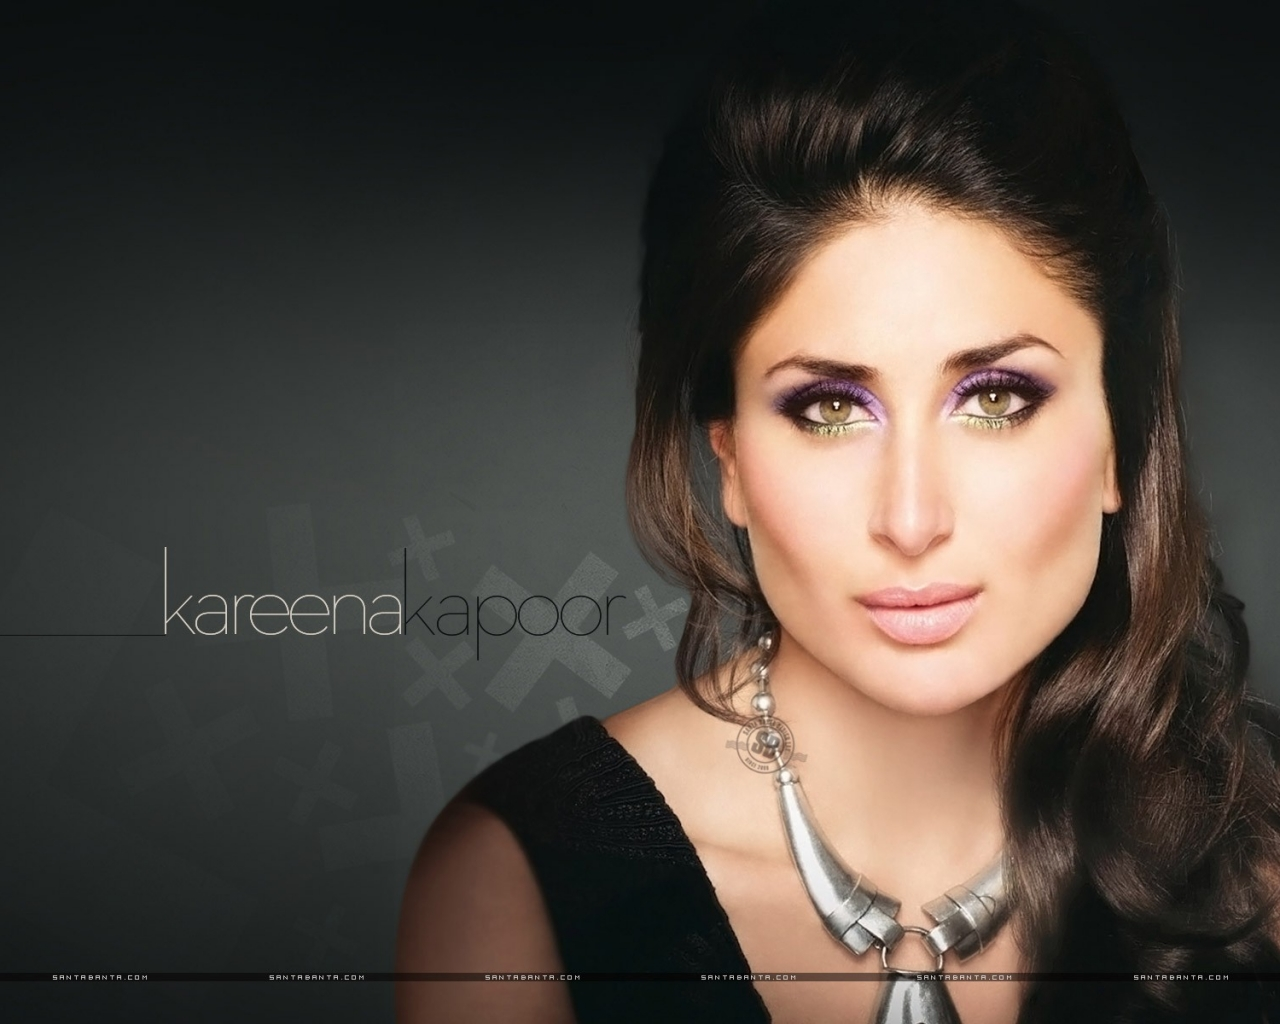 Kareena Kapoor - 1280x1024